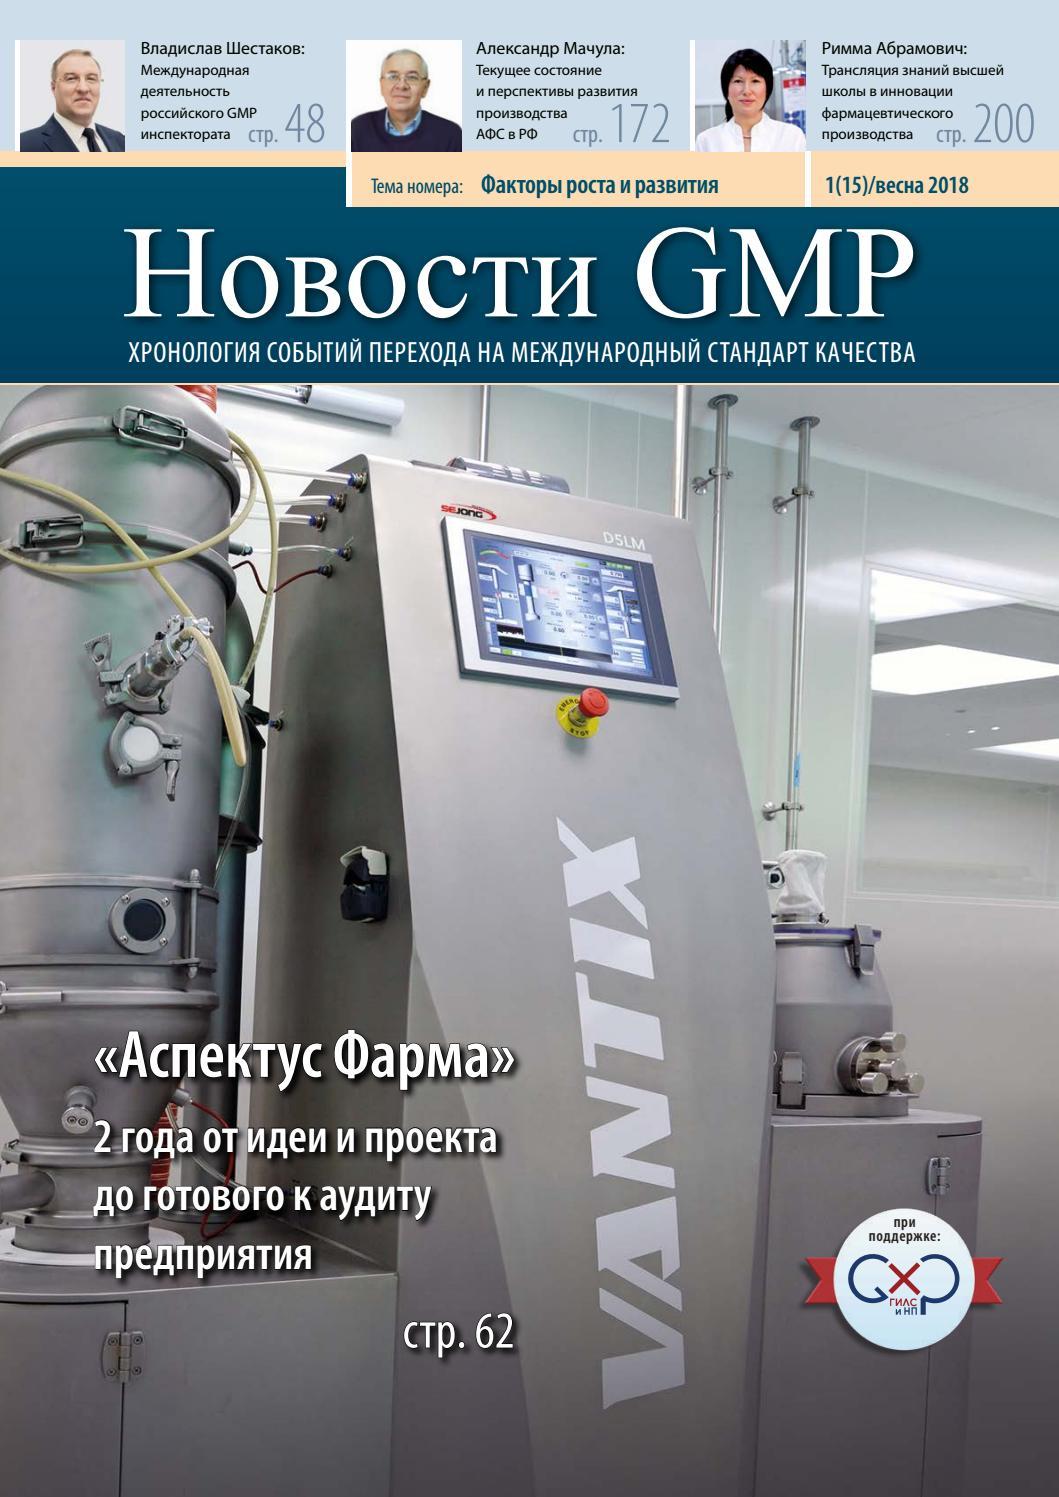 69fe8b2ea Новости GMP 1 (15) / весна 2018 by GMP news - issuu